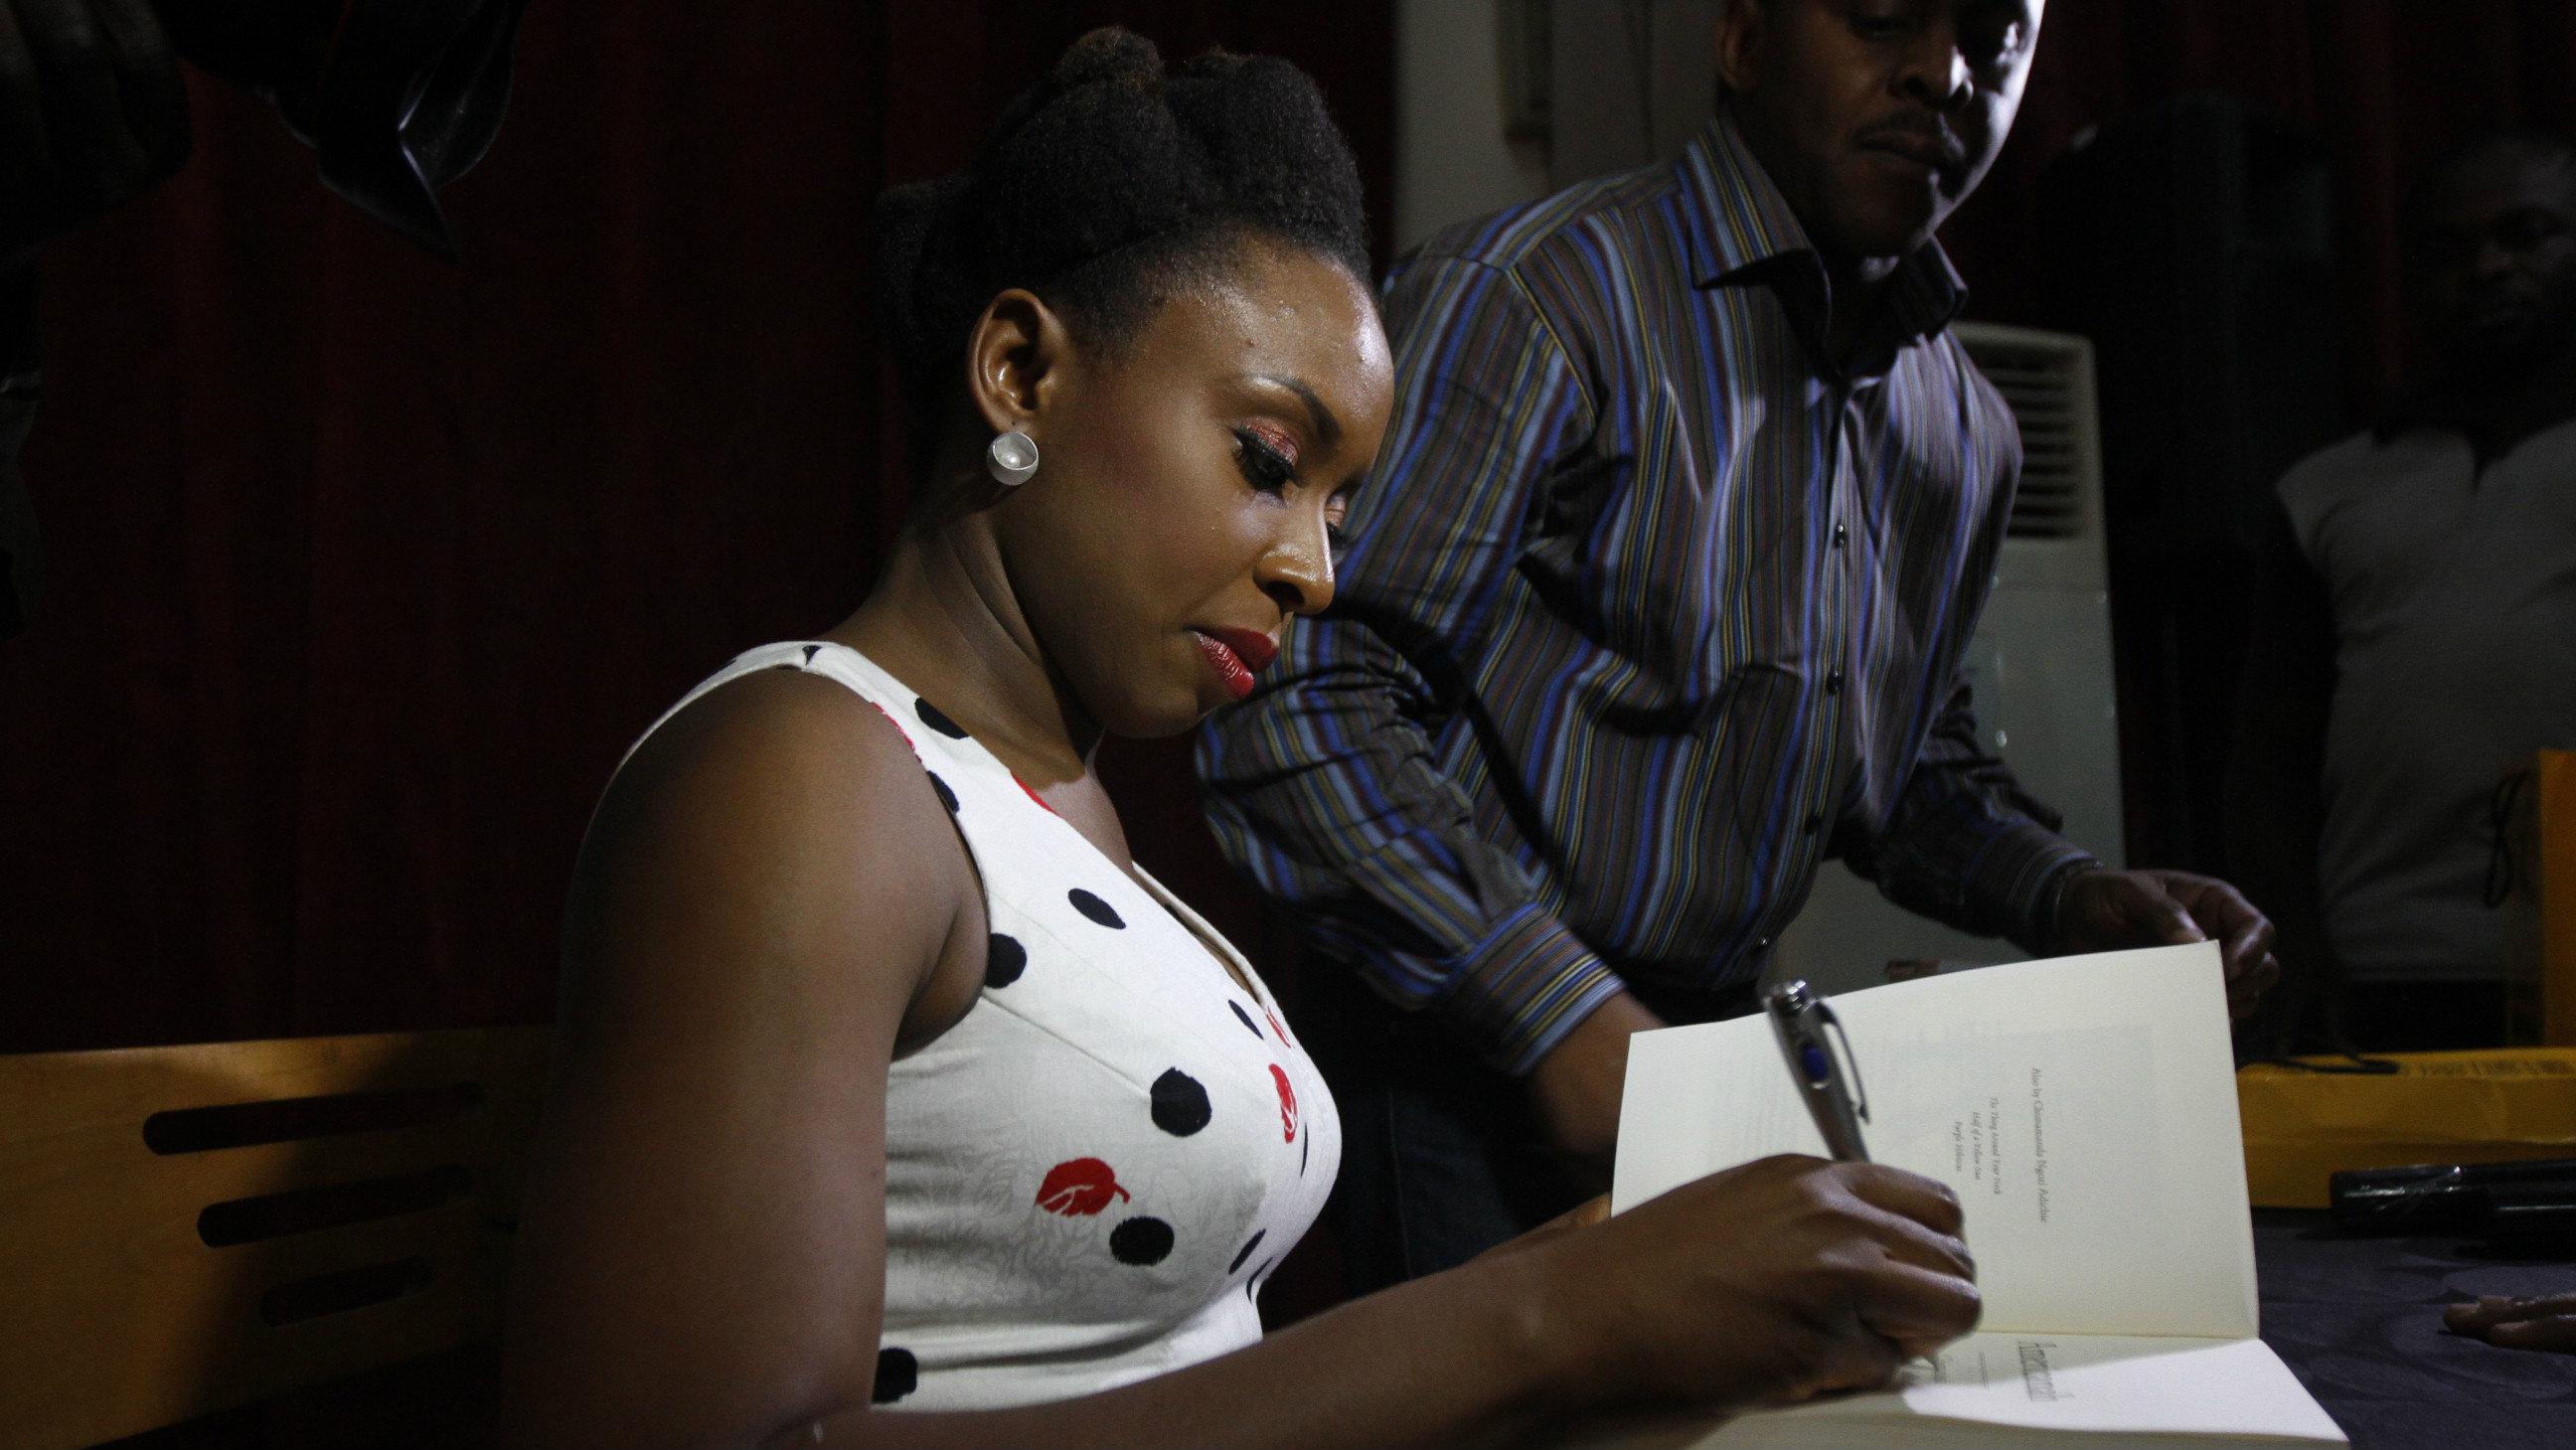 Chimamanda Ngozi Adichie activism